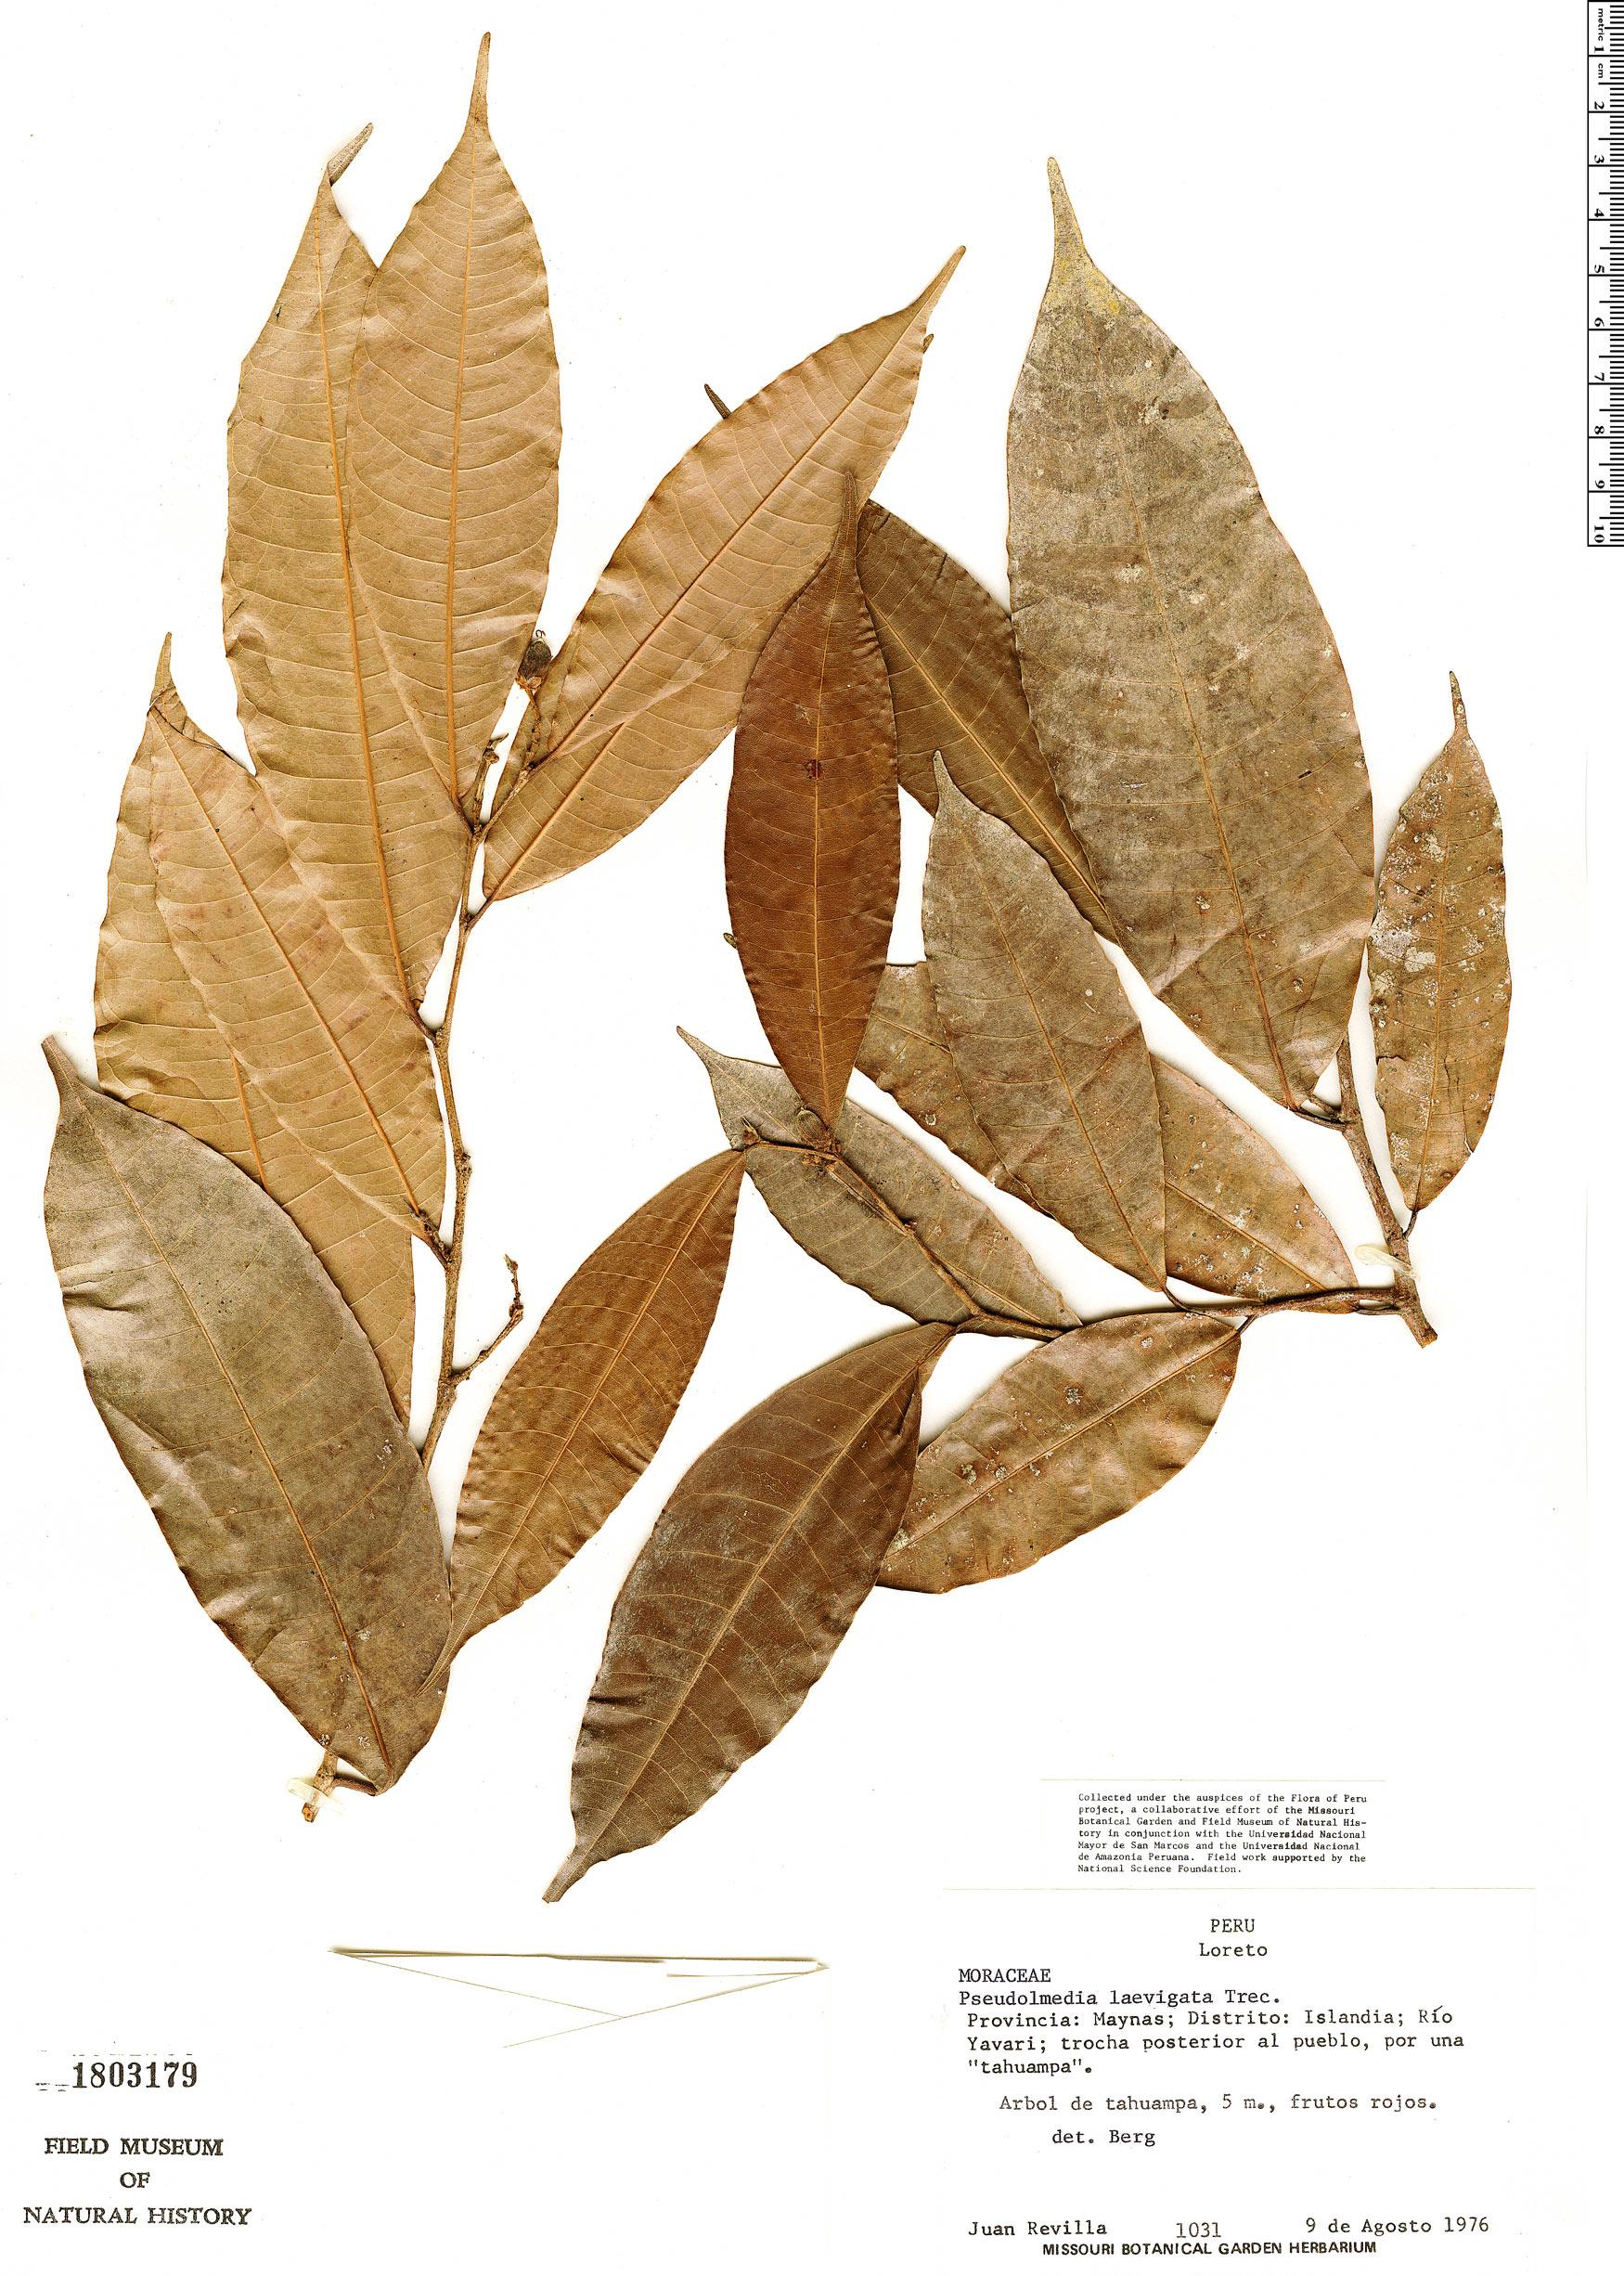 Specimen: Pseudolmedia laevigata